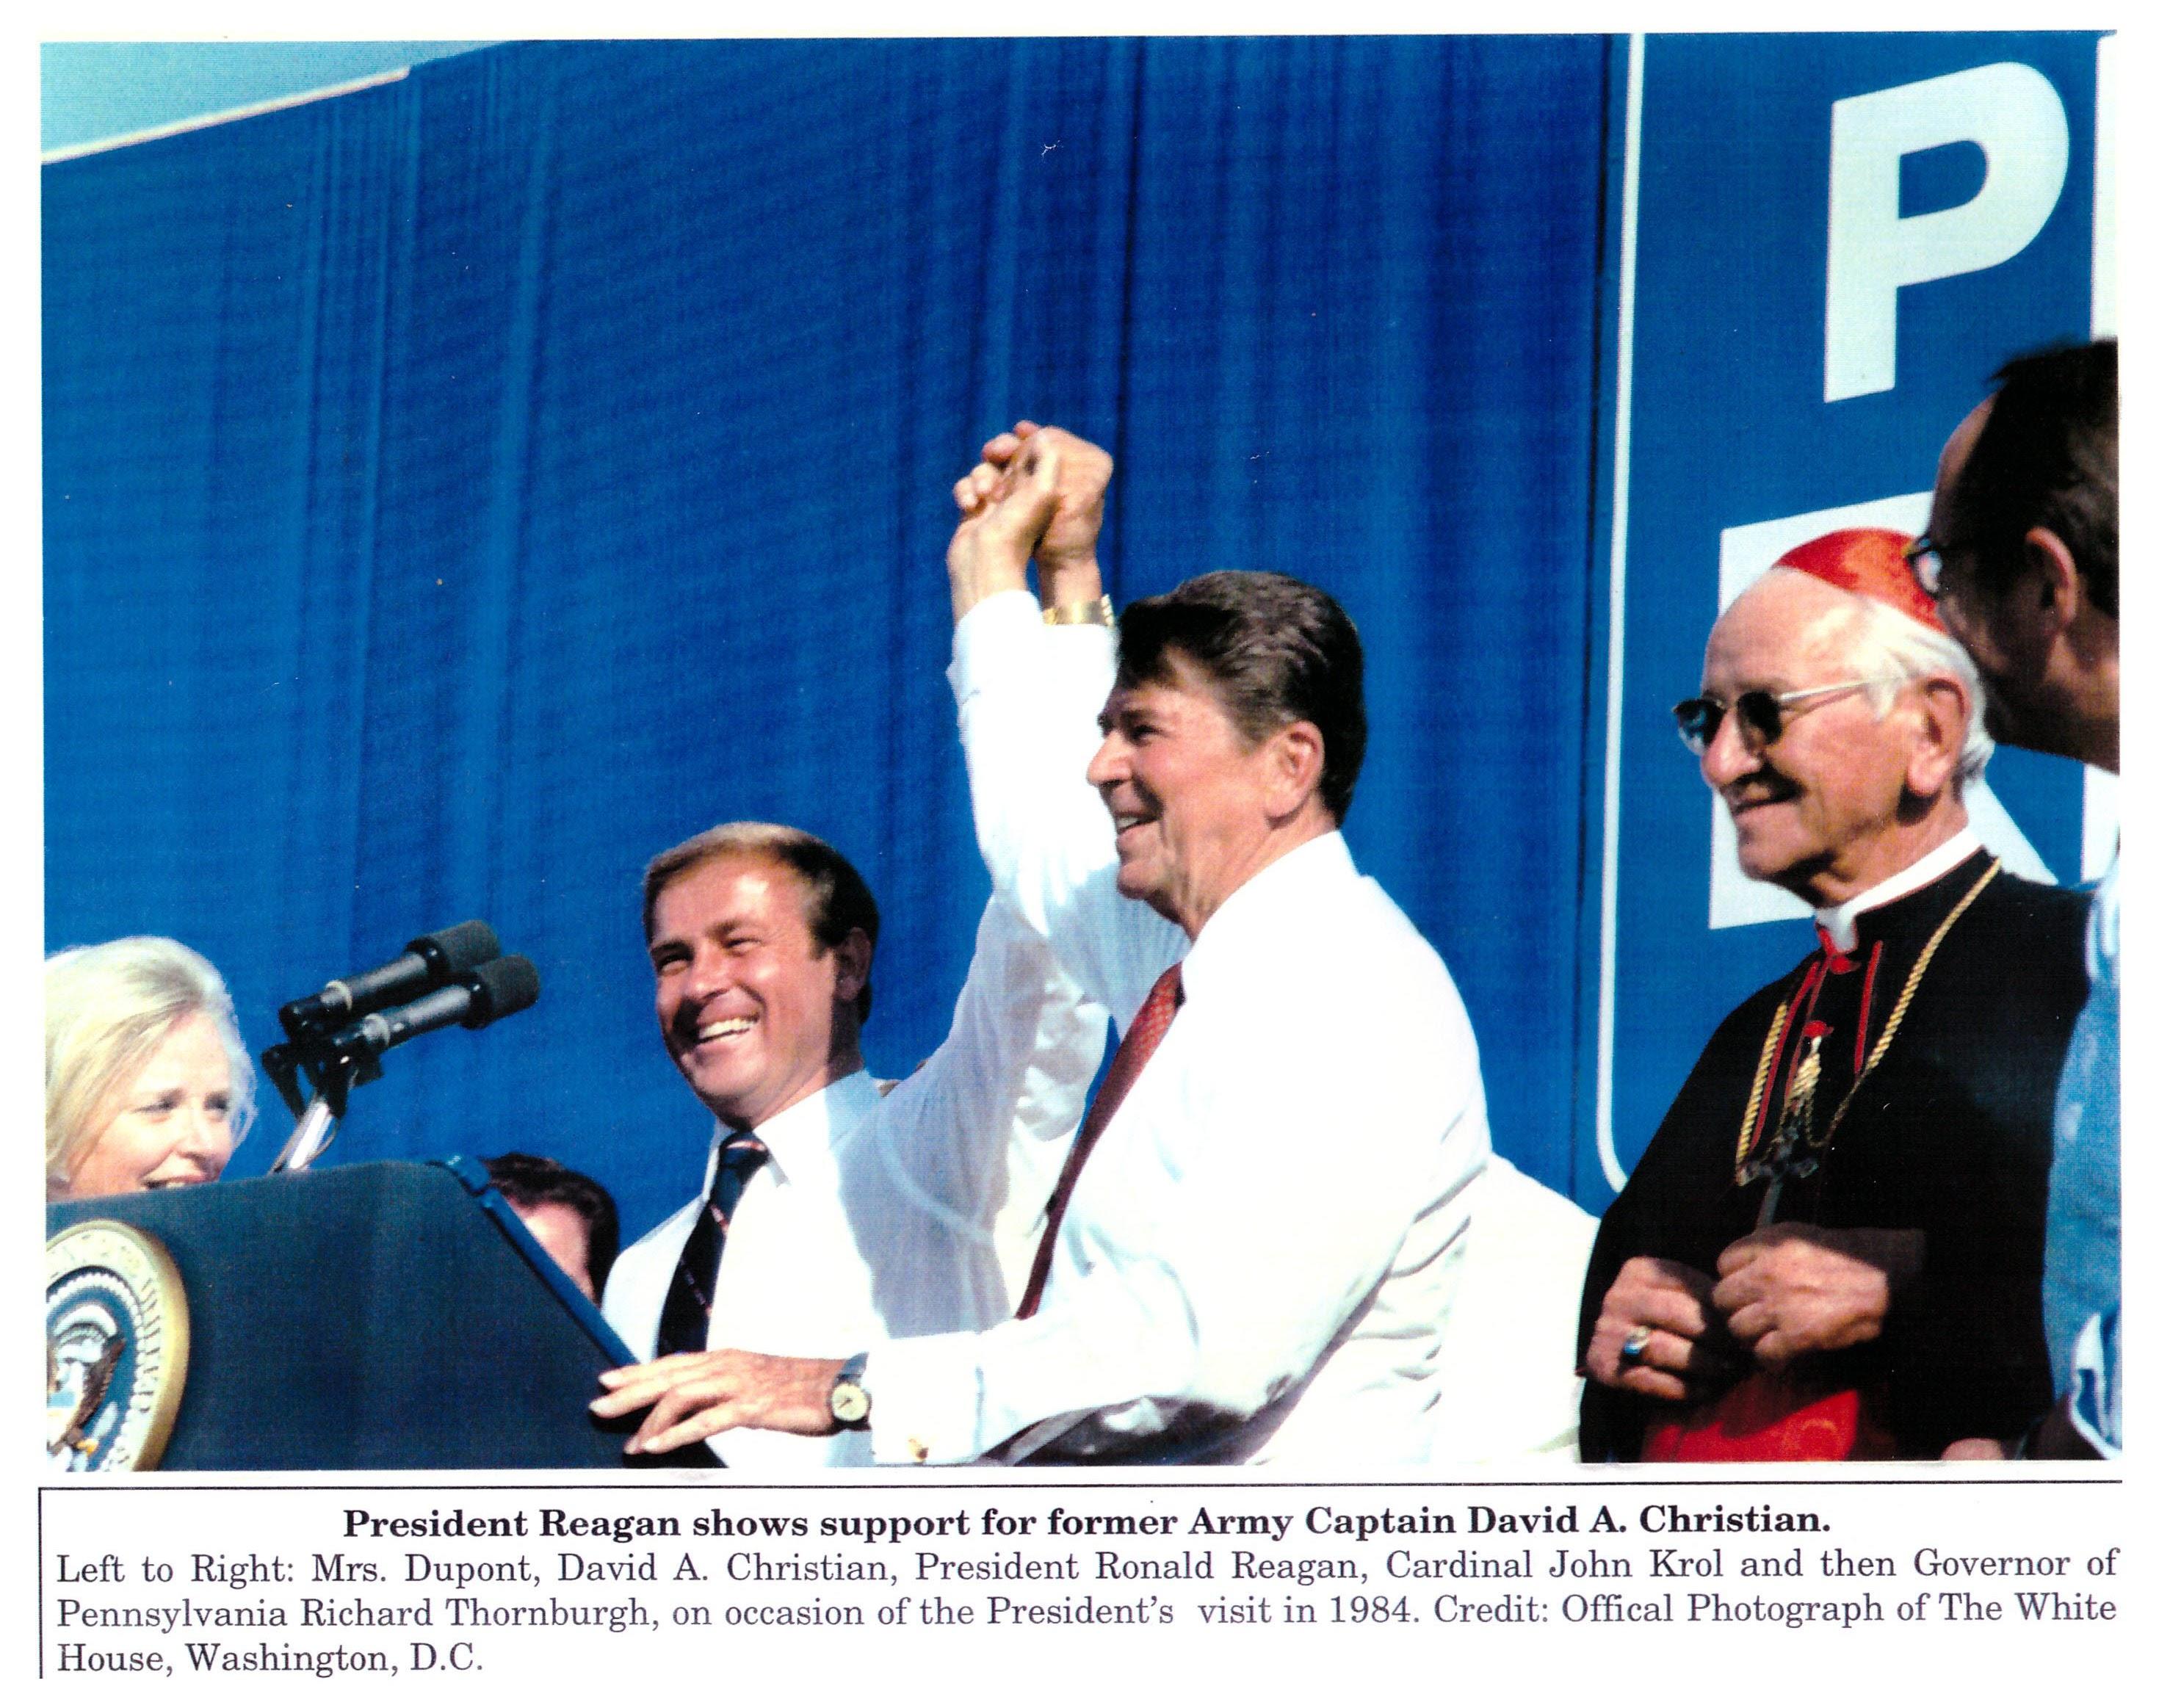 Ronald Reagan supports David A. Christian